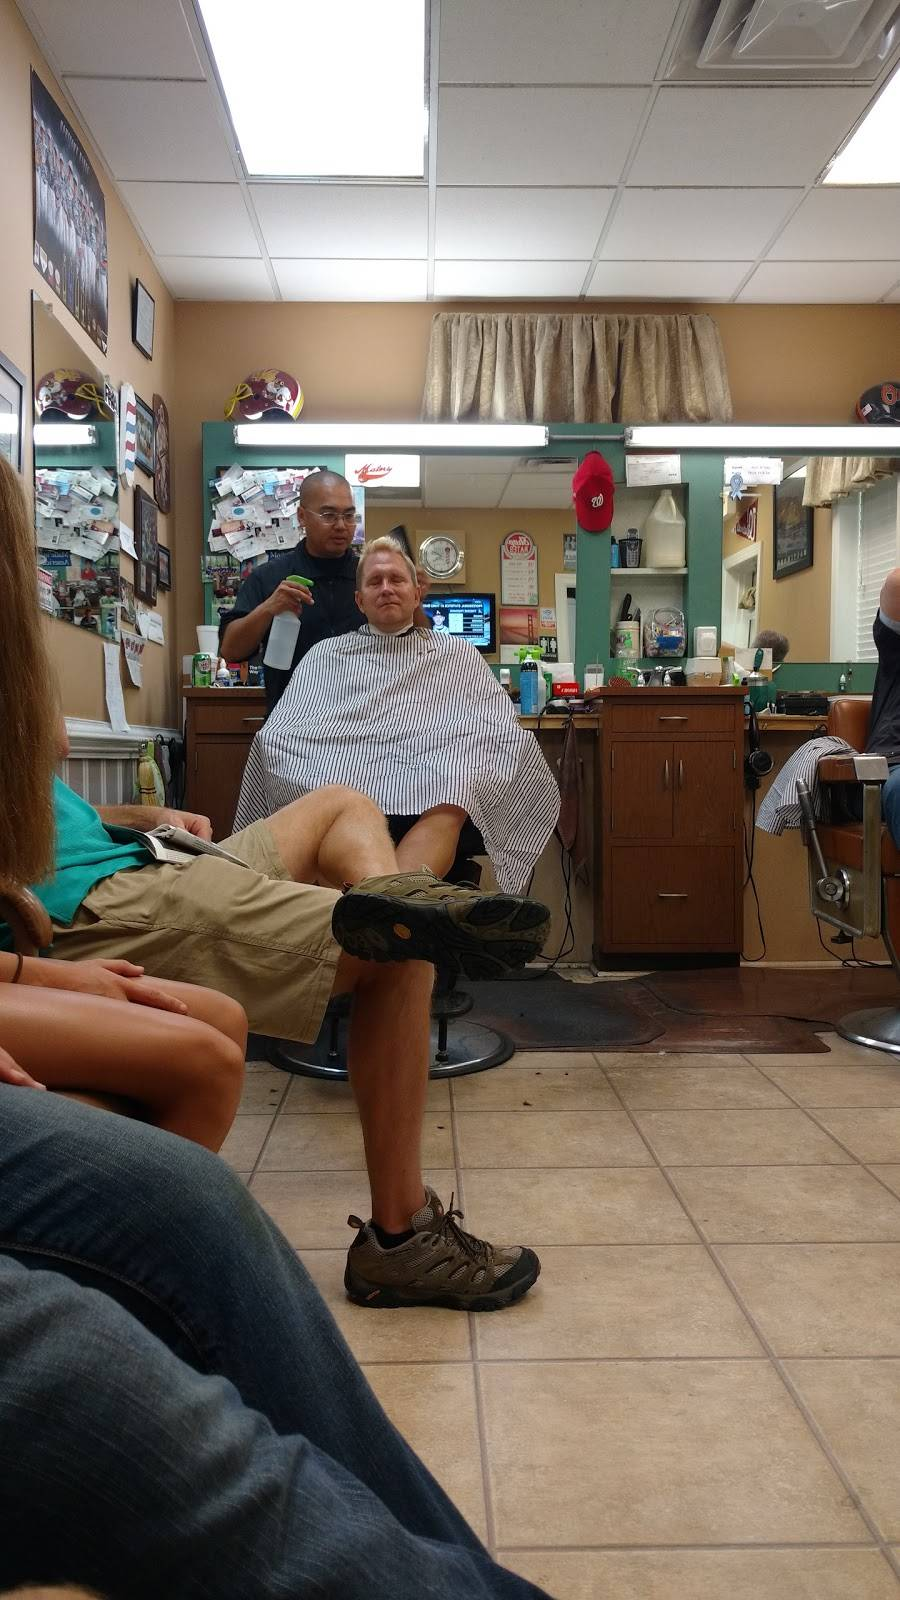 Azalea Barber Shop - hair care    Photo 1 of 1   Address: 9235 Shady Grove Rd # 110, Mechanicsville, VA 23116, USA   Phone: (804) 746-7272